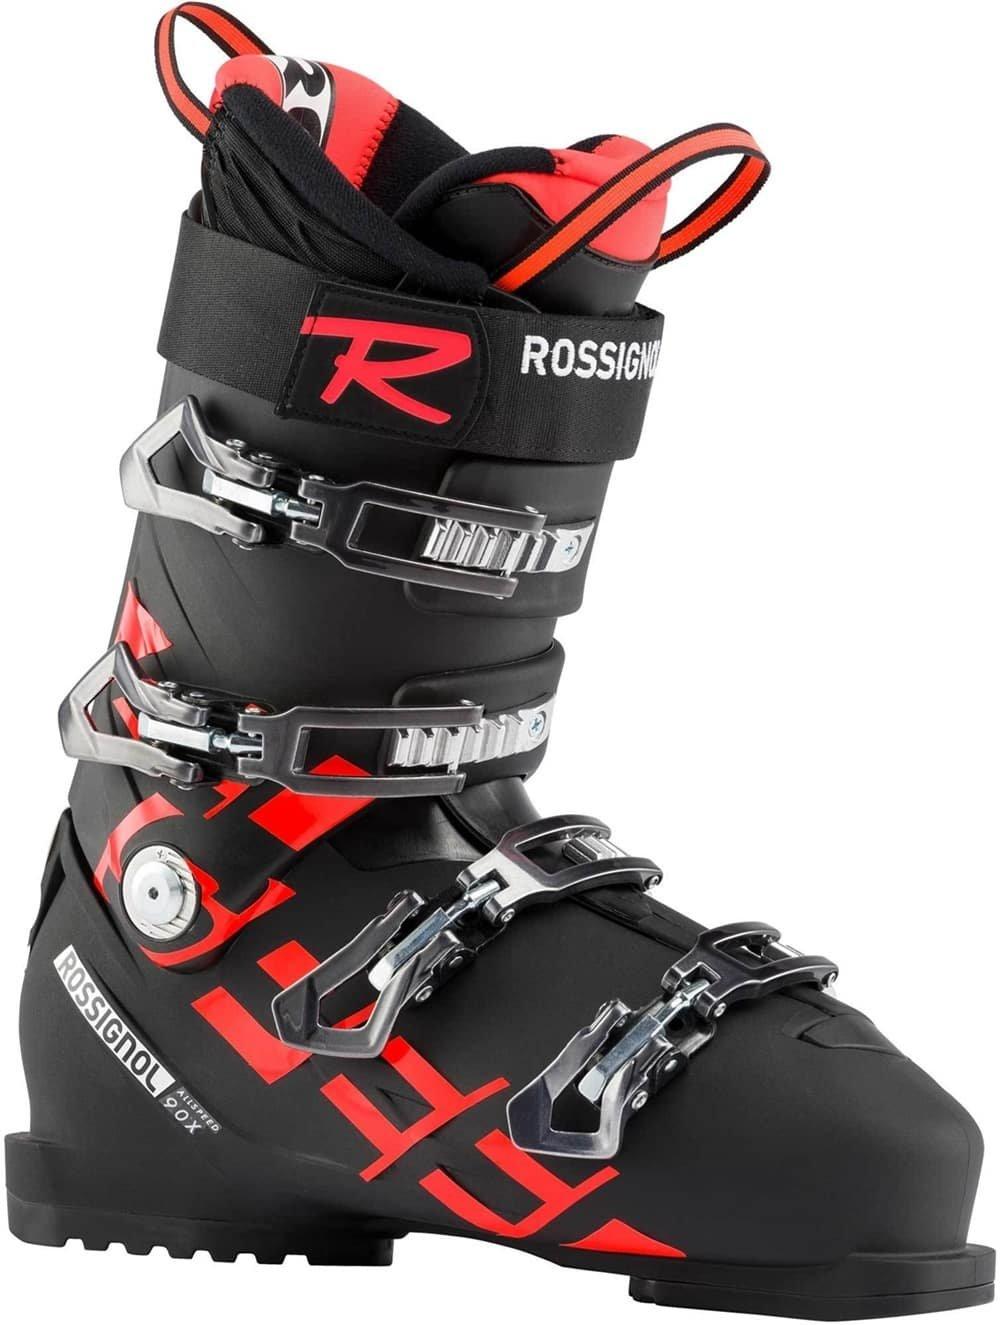 Rossignol Allspeed 90 X 26,5 cm